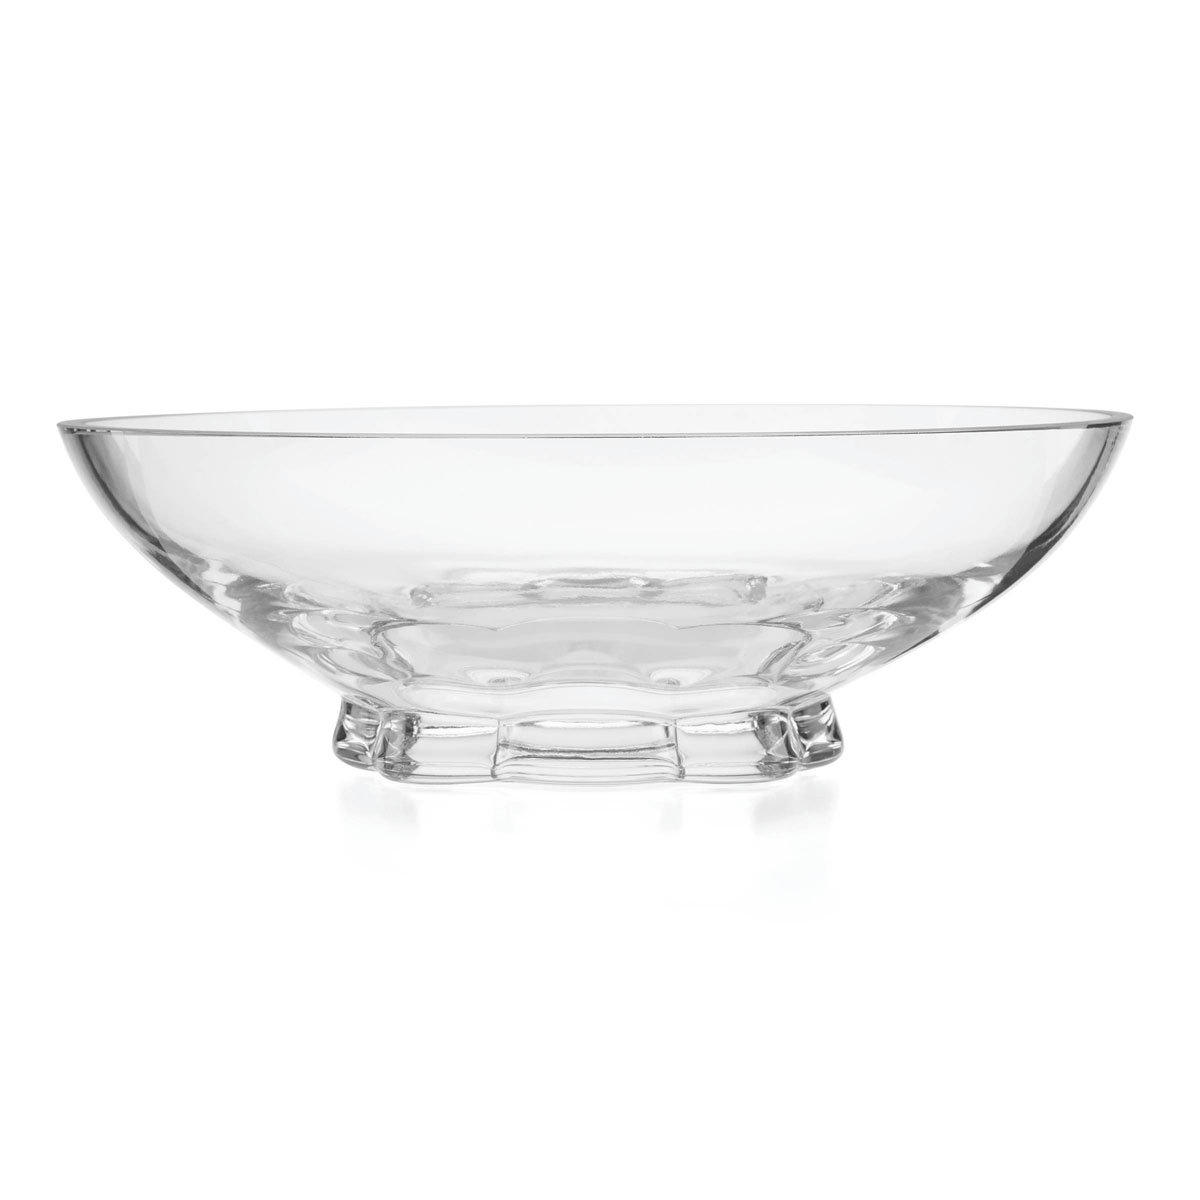 kate spade new york Lenox Gramercy Centerpiece Bowl with Glass Foot